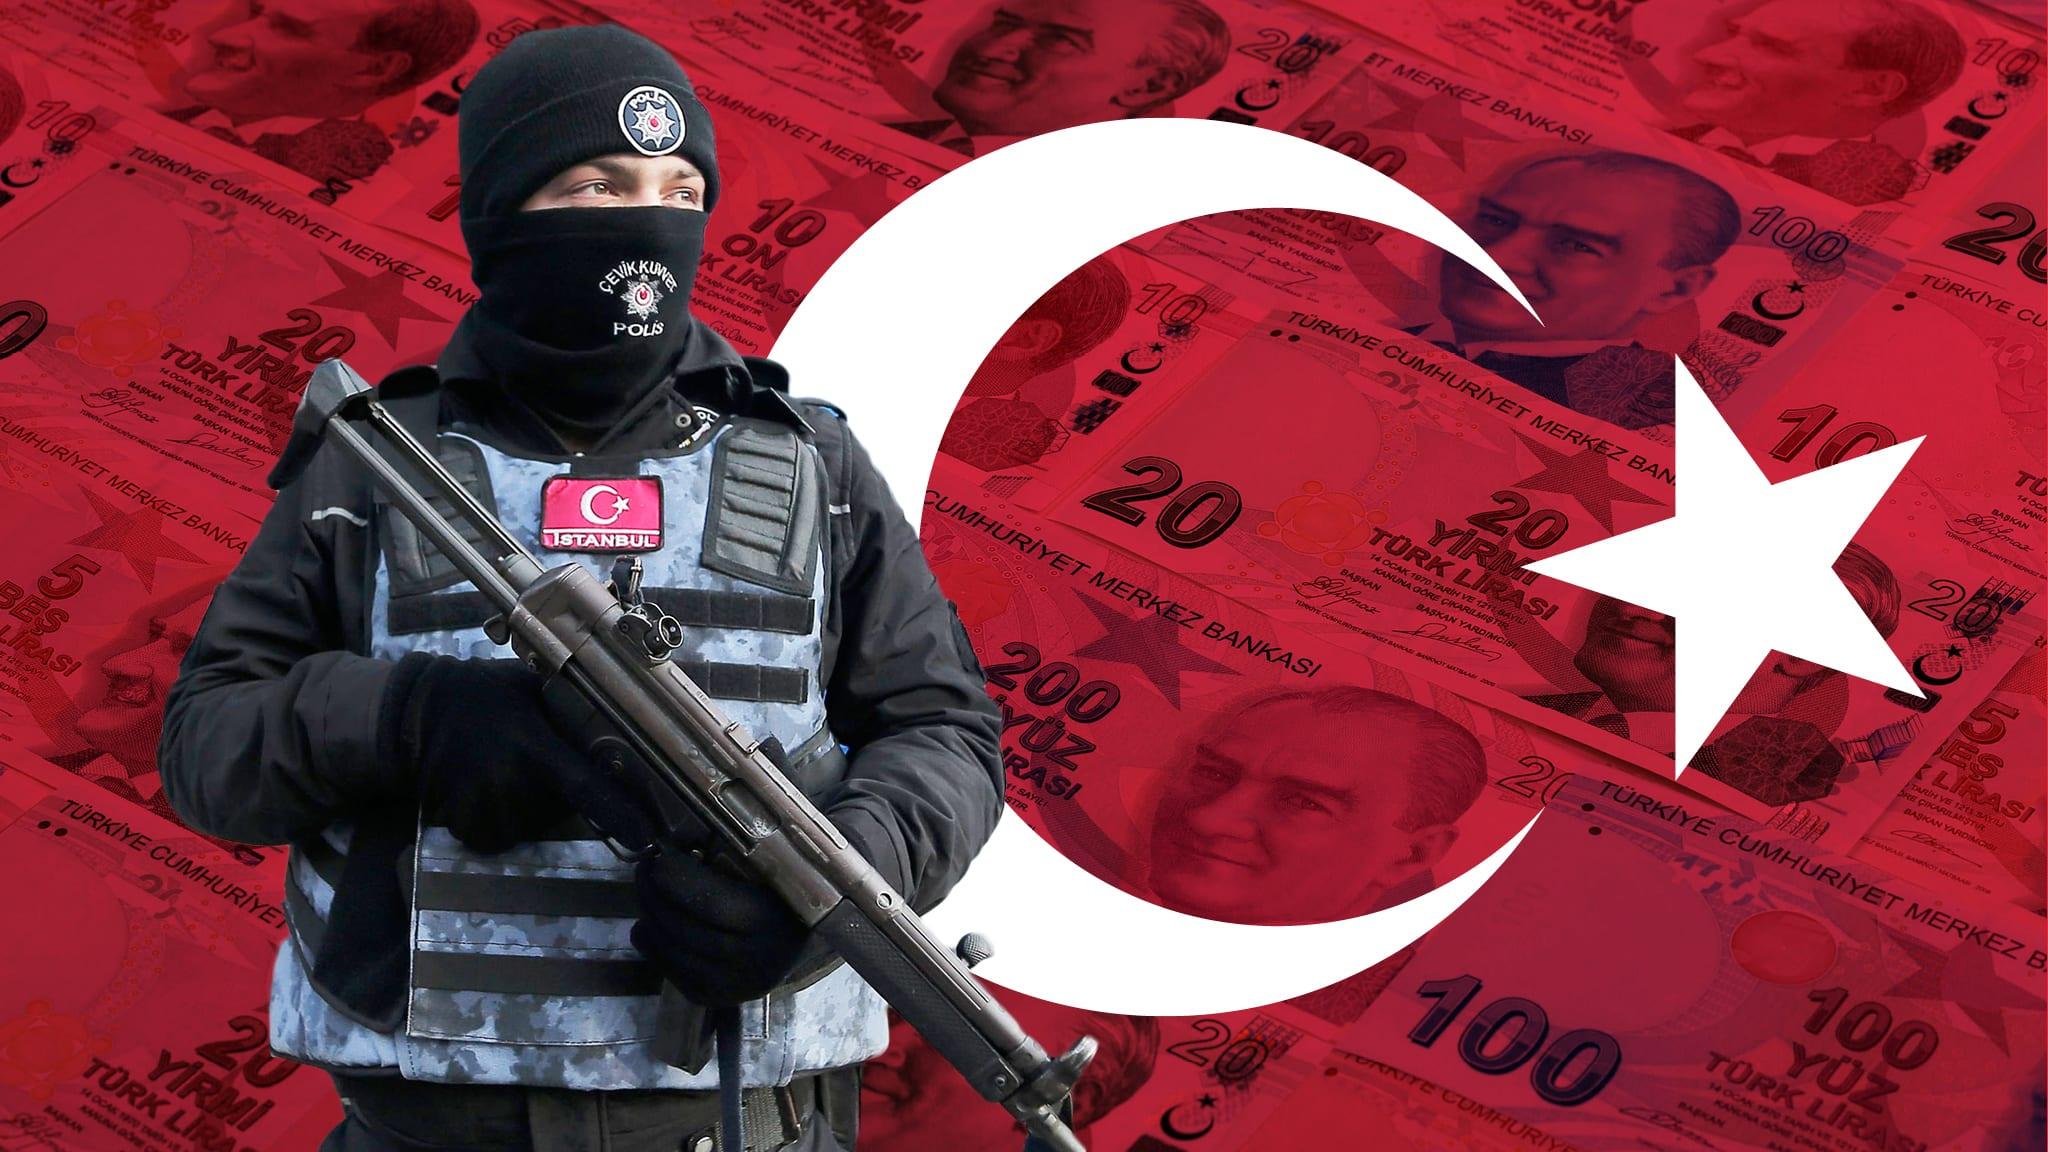 %D8%AA%D8%B1%D9%83%D9%8A%D8%A7 تركيا تنهار اقتصاديا: استثمر مليون دولار واحصل على الجنسية التركية